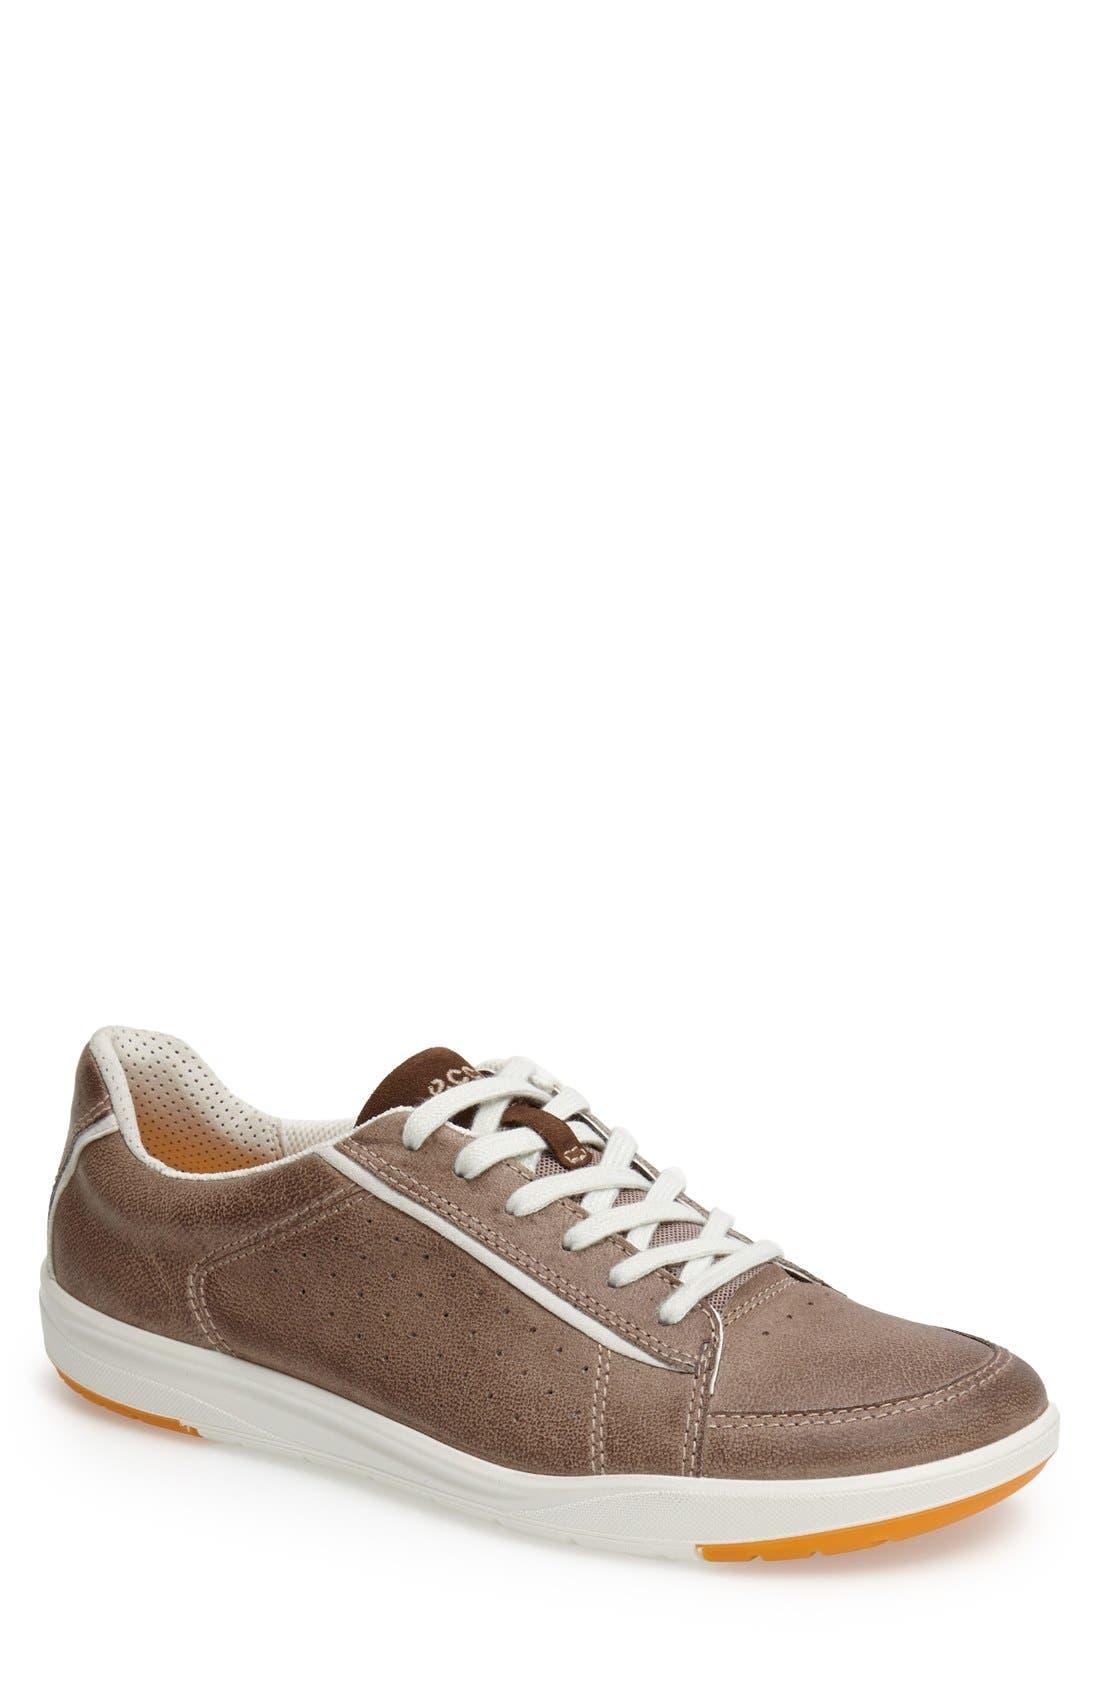 Alternate Image 1 Selected - ECCO 'Eldon' Sneaker (Men)